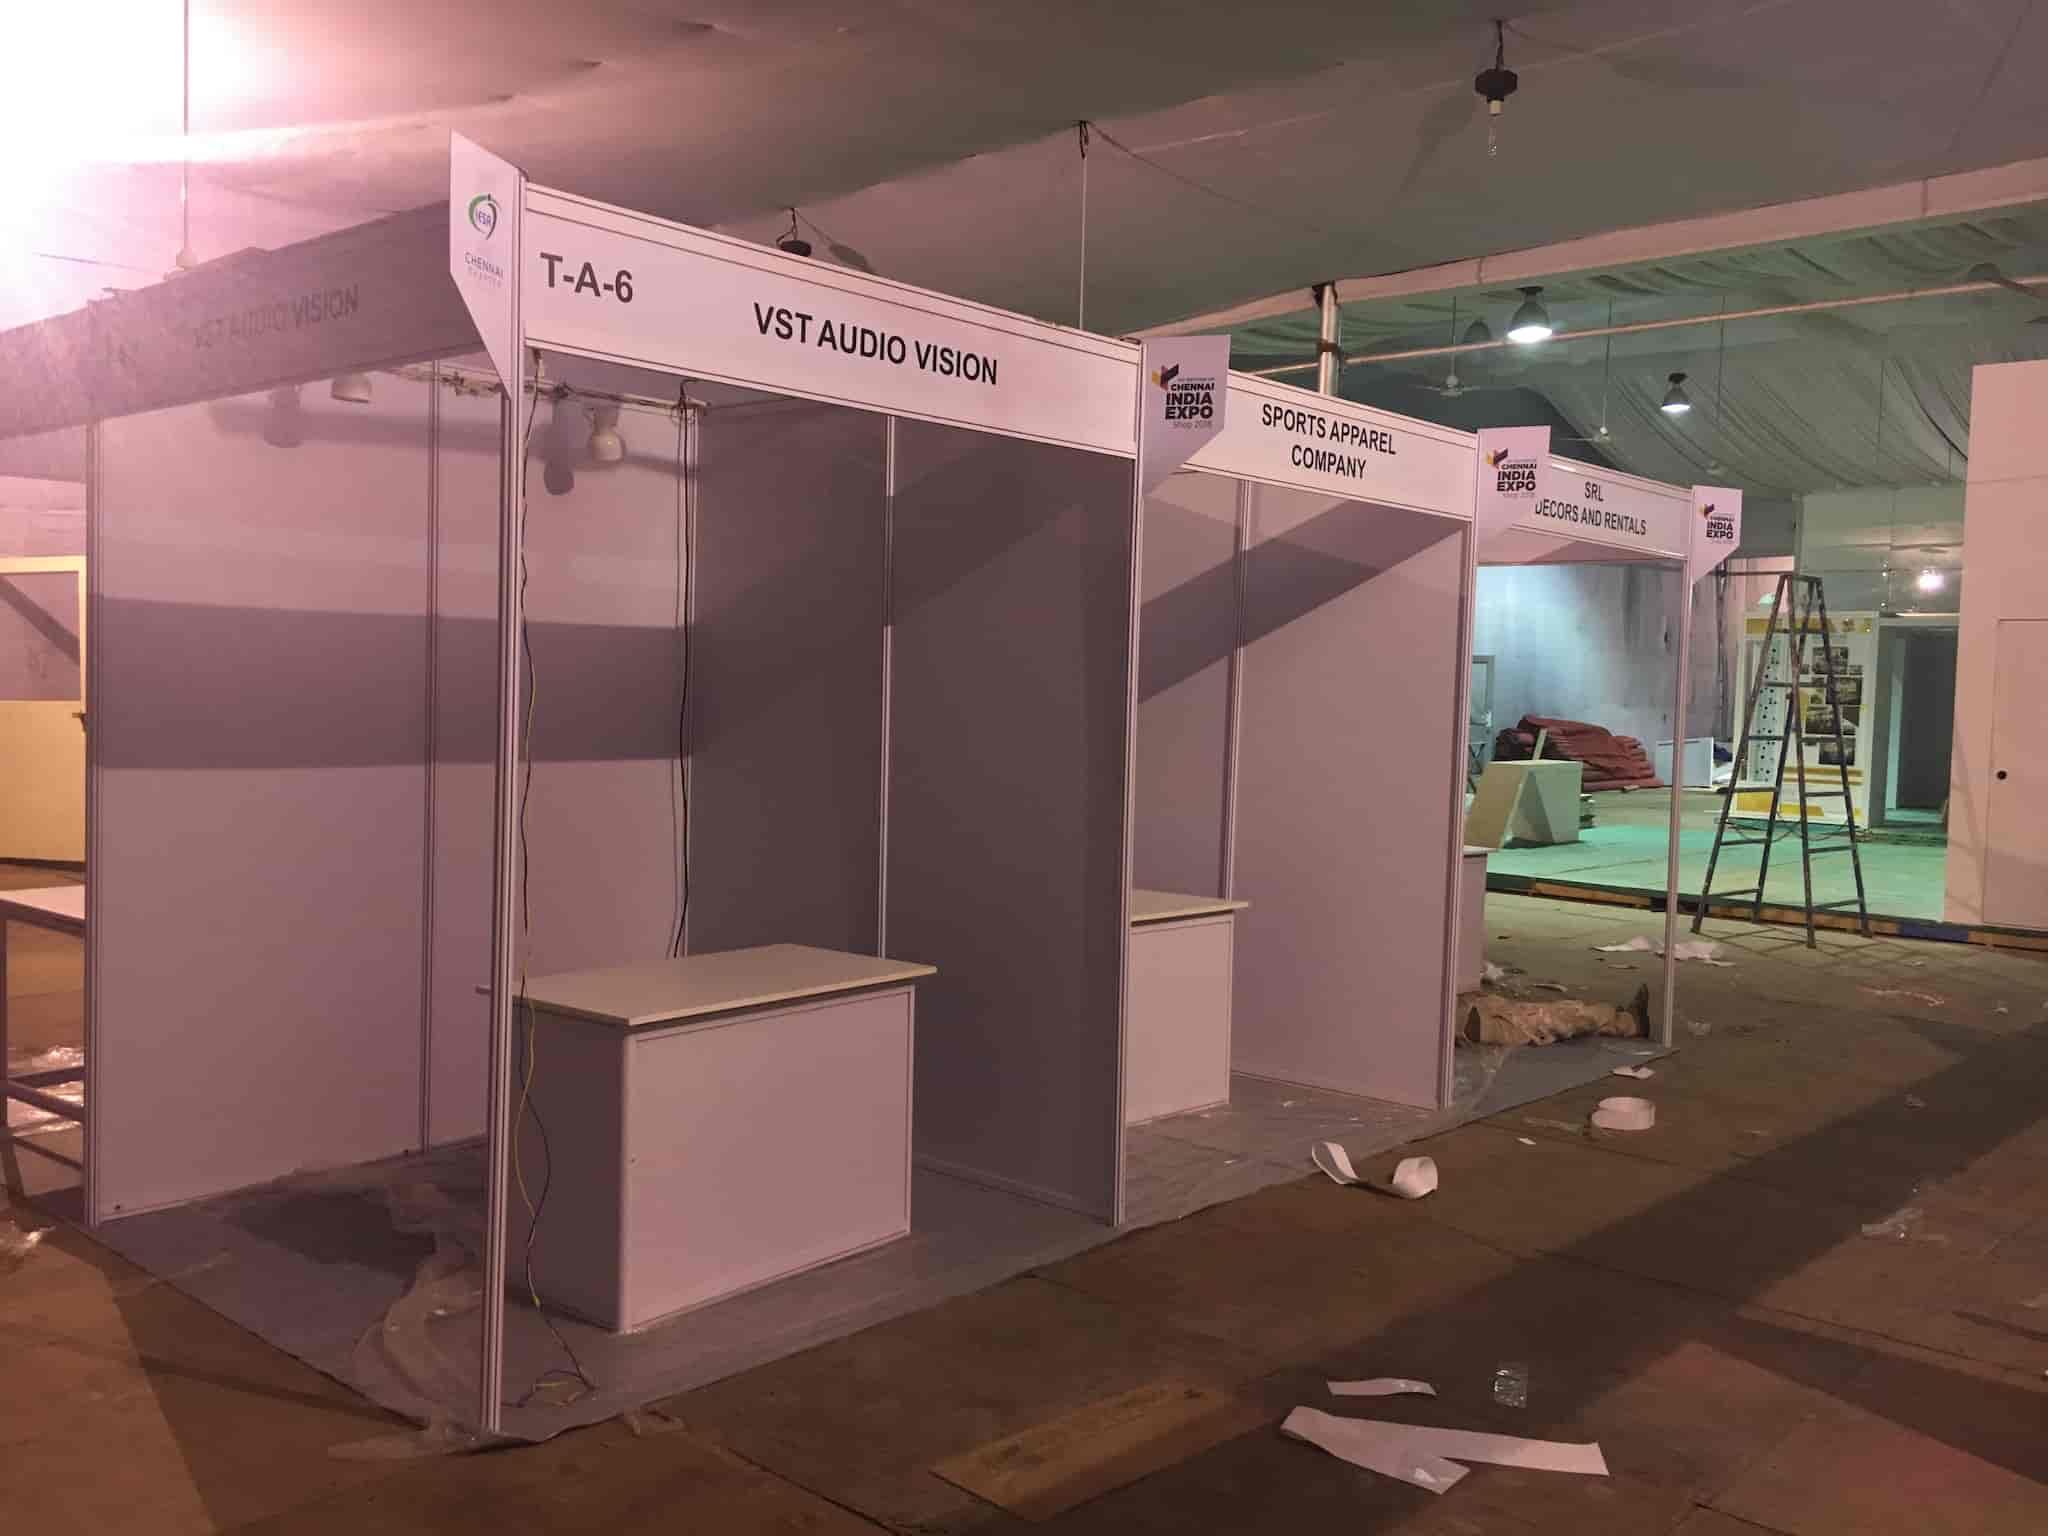 Exhibition Stall Rental In Chennai : Creatta exhibition stalls nerkundram koyambedu exhibition stalls